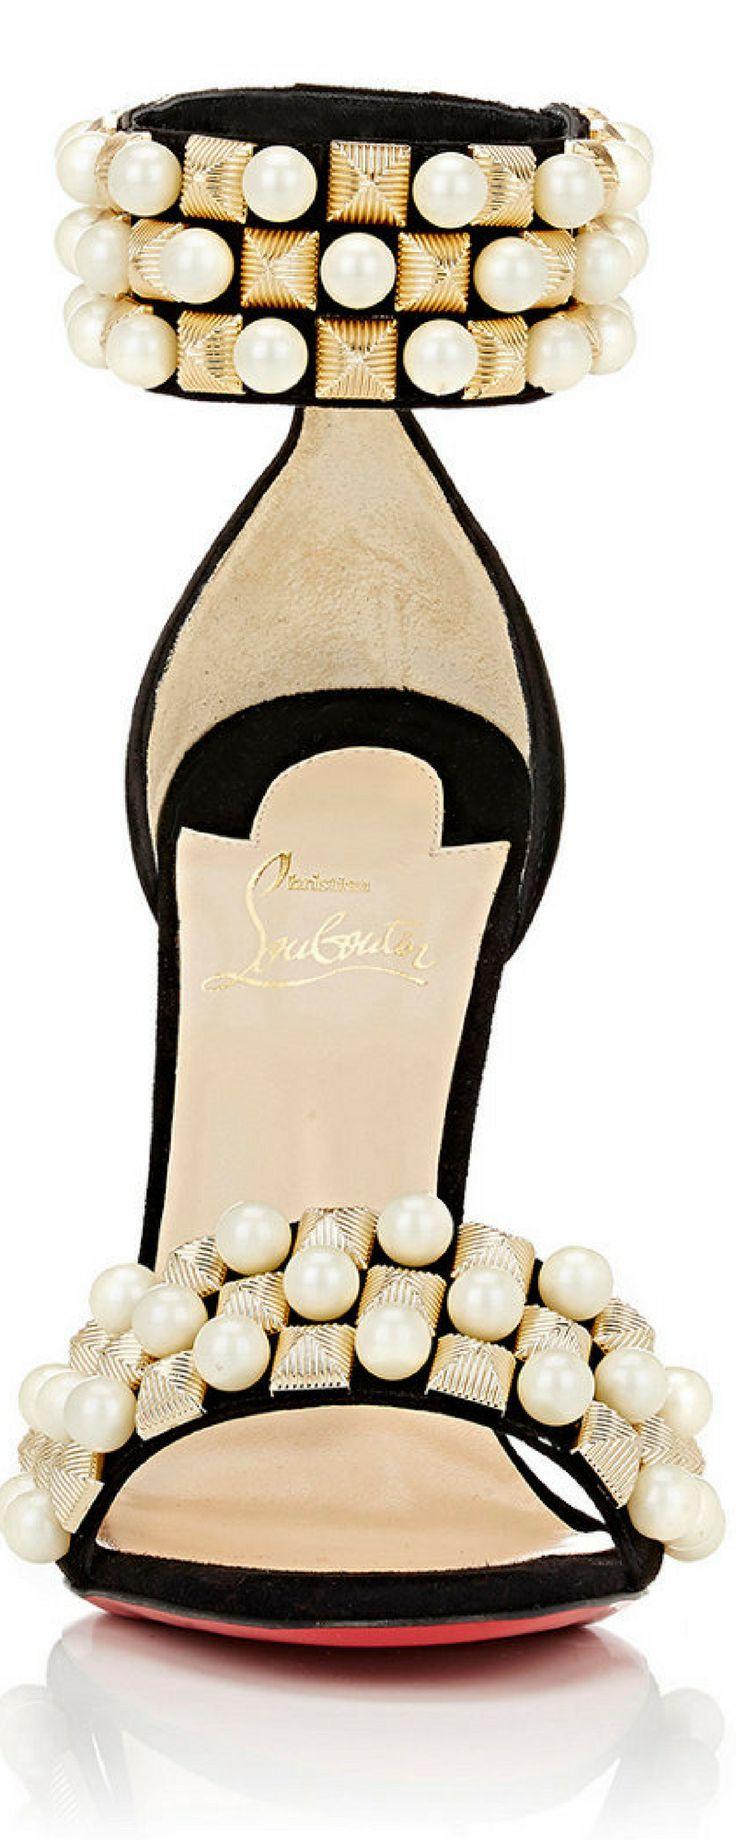 CHRISTIAN LOUBOUTIN Tudor Bal Sandals (affiliate)